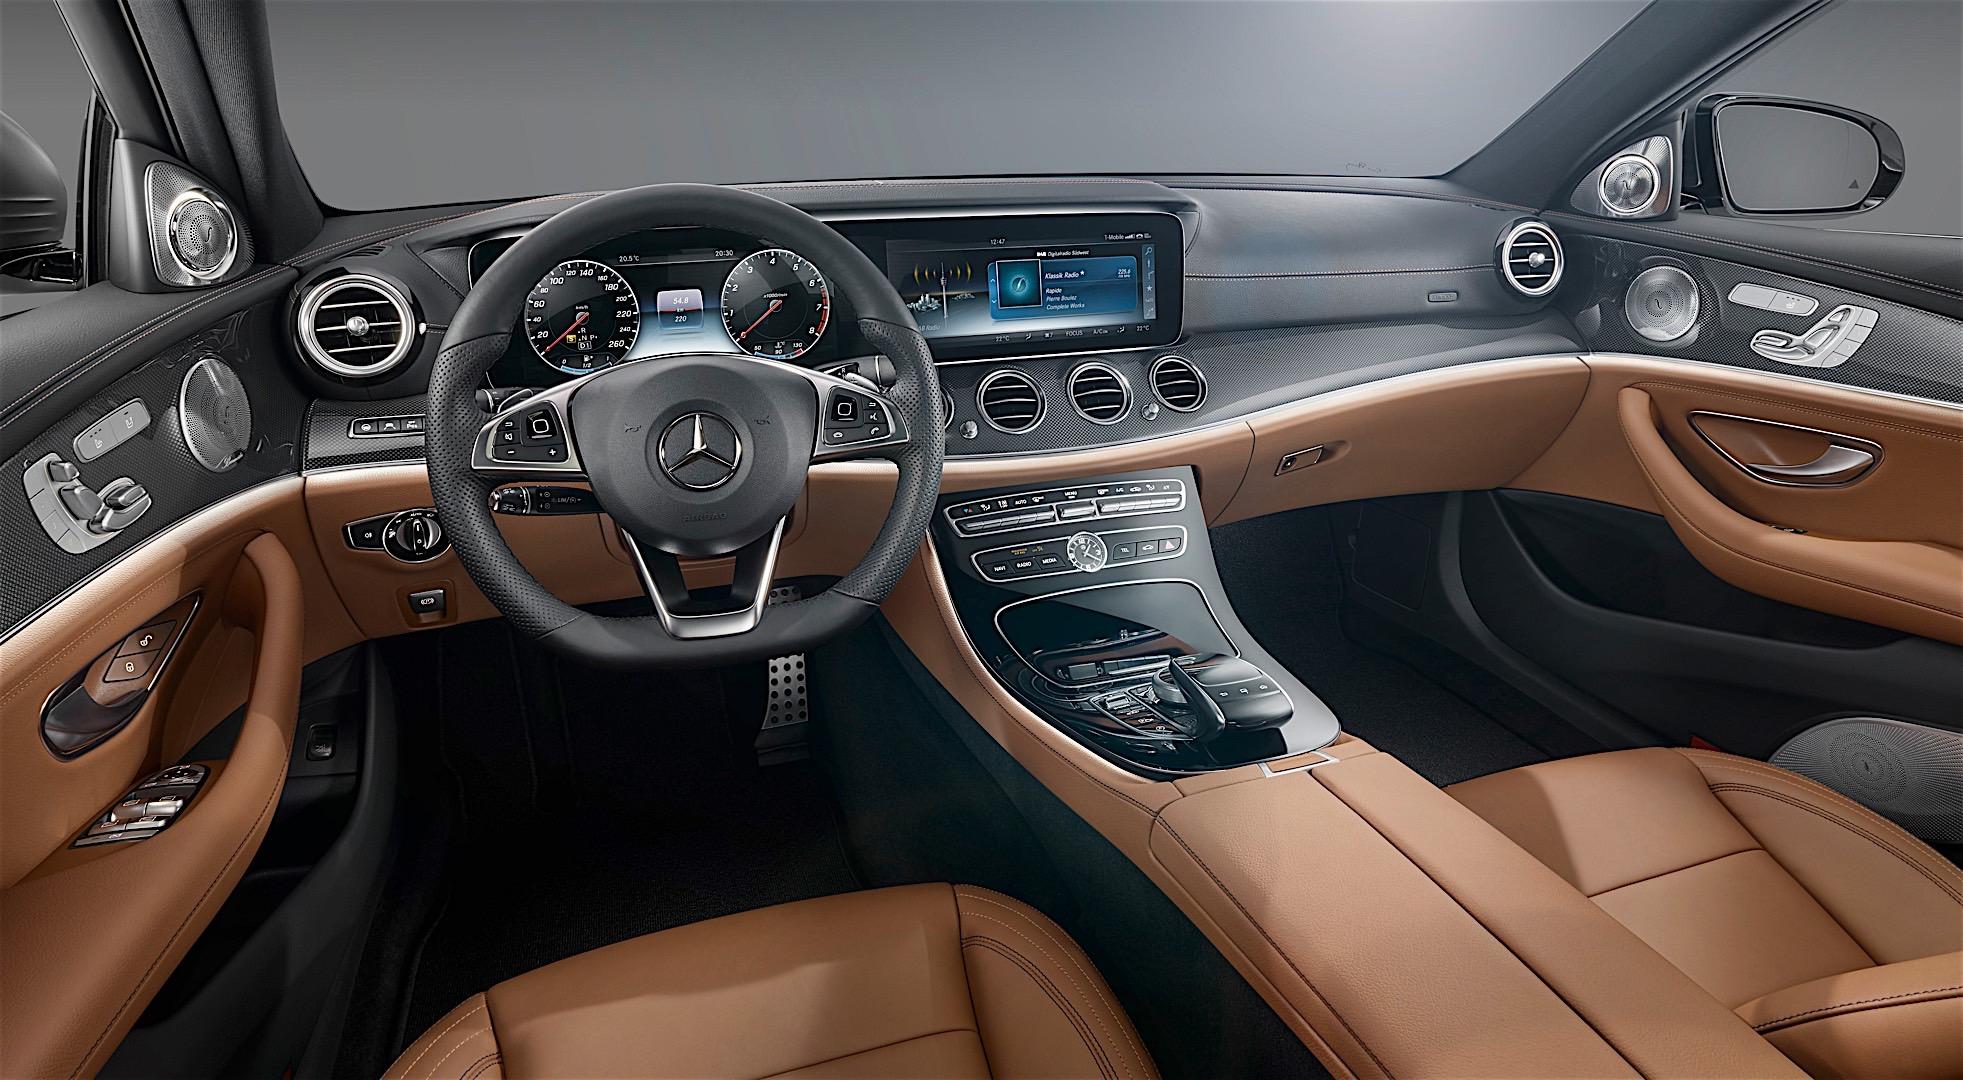 https://s1.cdn.autoevolution.com/images/news/2018-mercedes-benz-e-class-interior-officially-unveiled-will-rival-the-s-class-102722_1.jpg